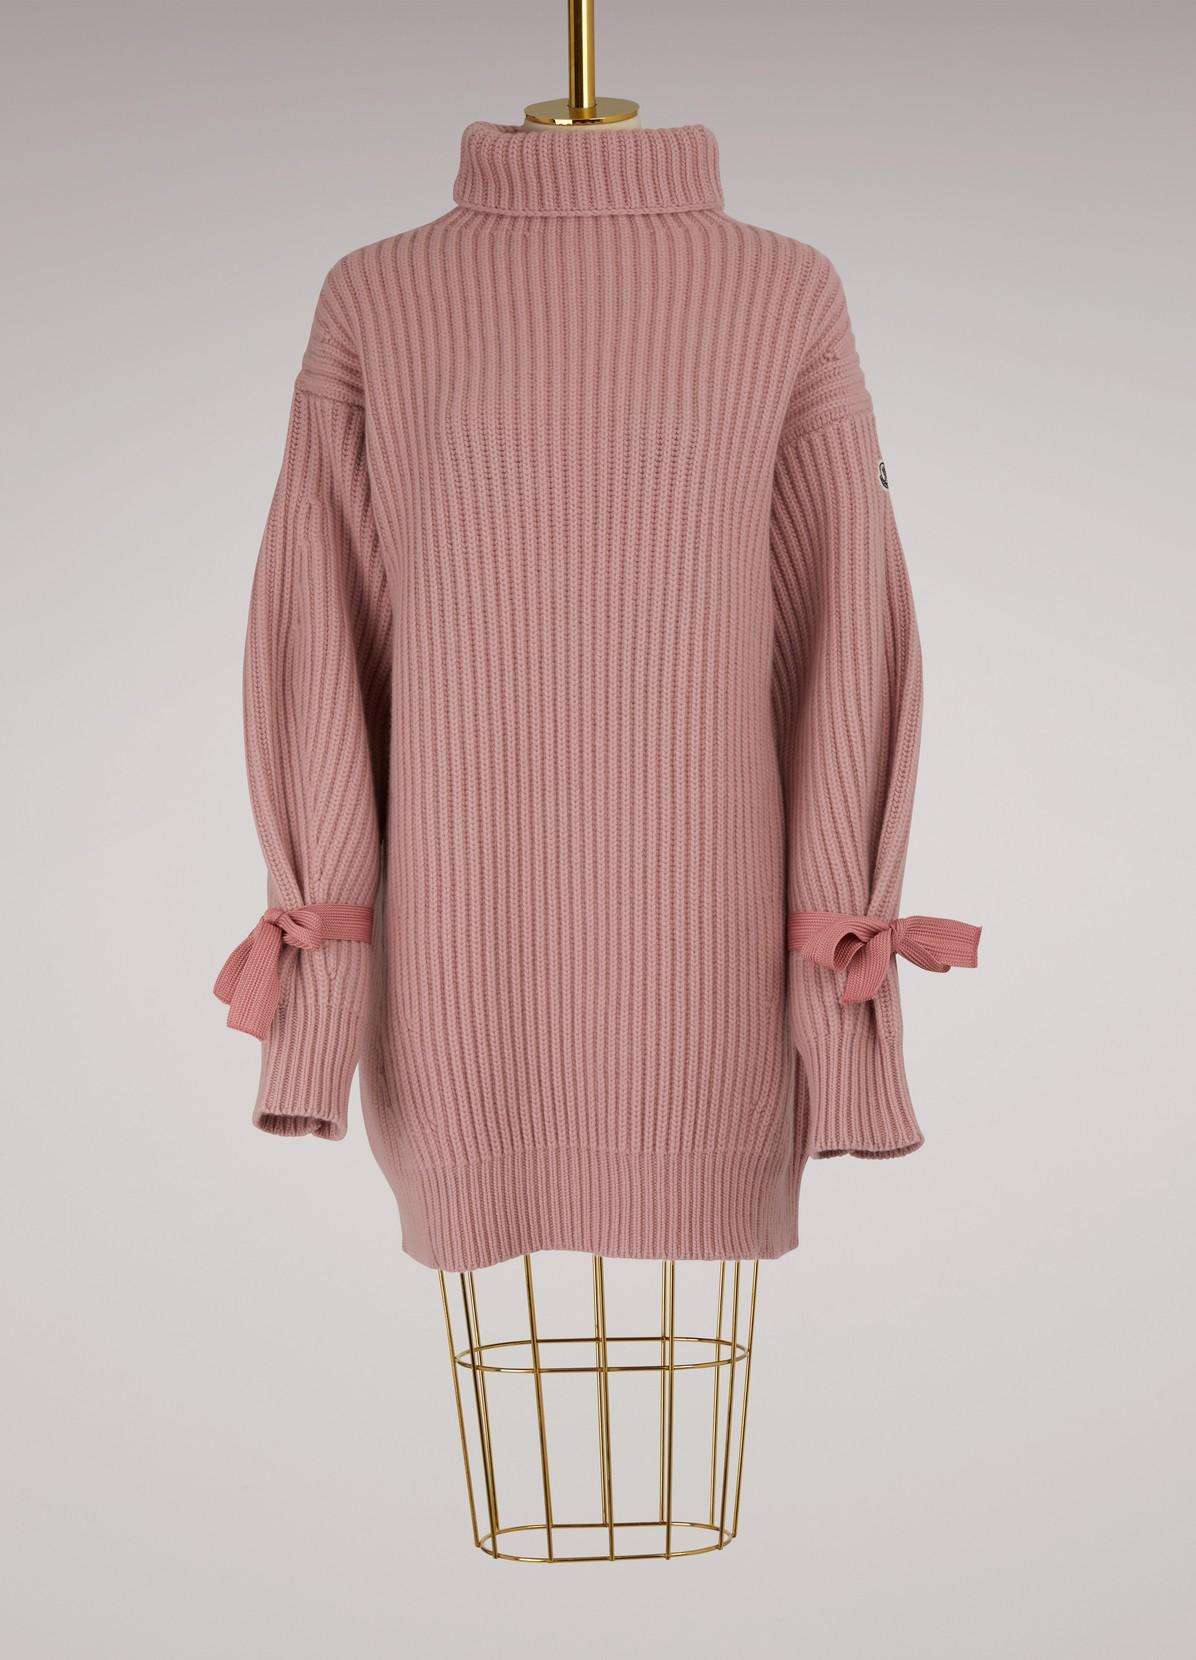 robe pull en laine et cachemire moncler 24 s vres. Black Bedroom Furniture Sets. Home Design Ideas